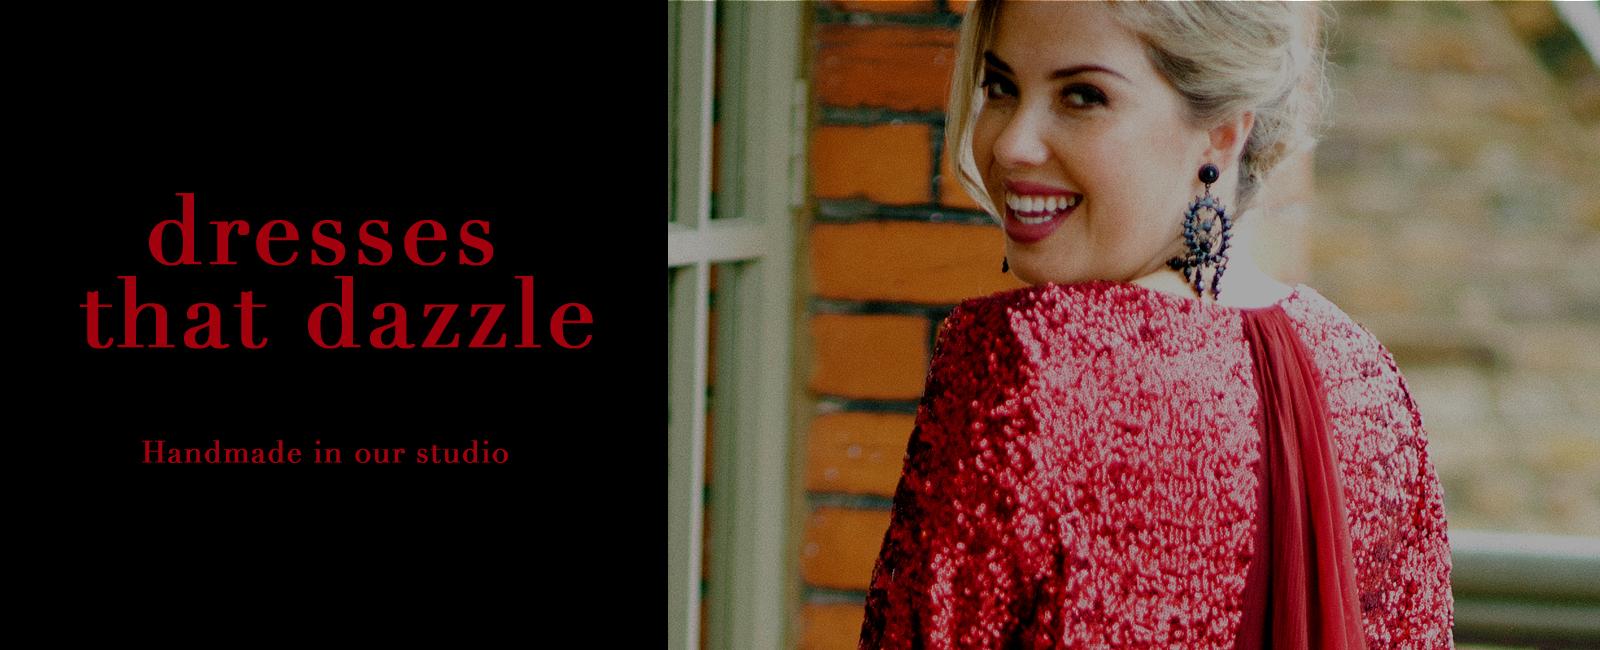 dresses-that-dazzle